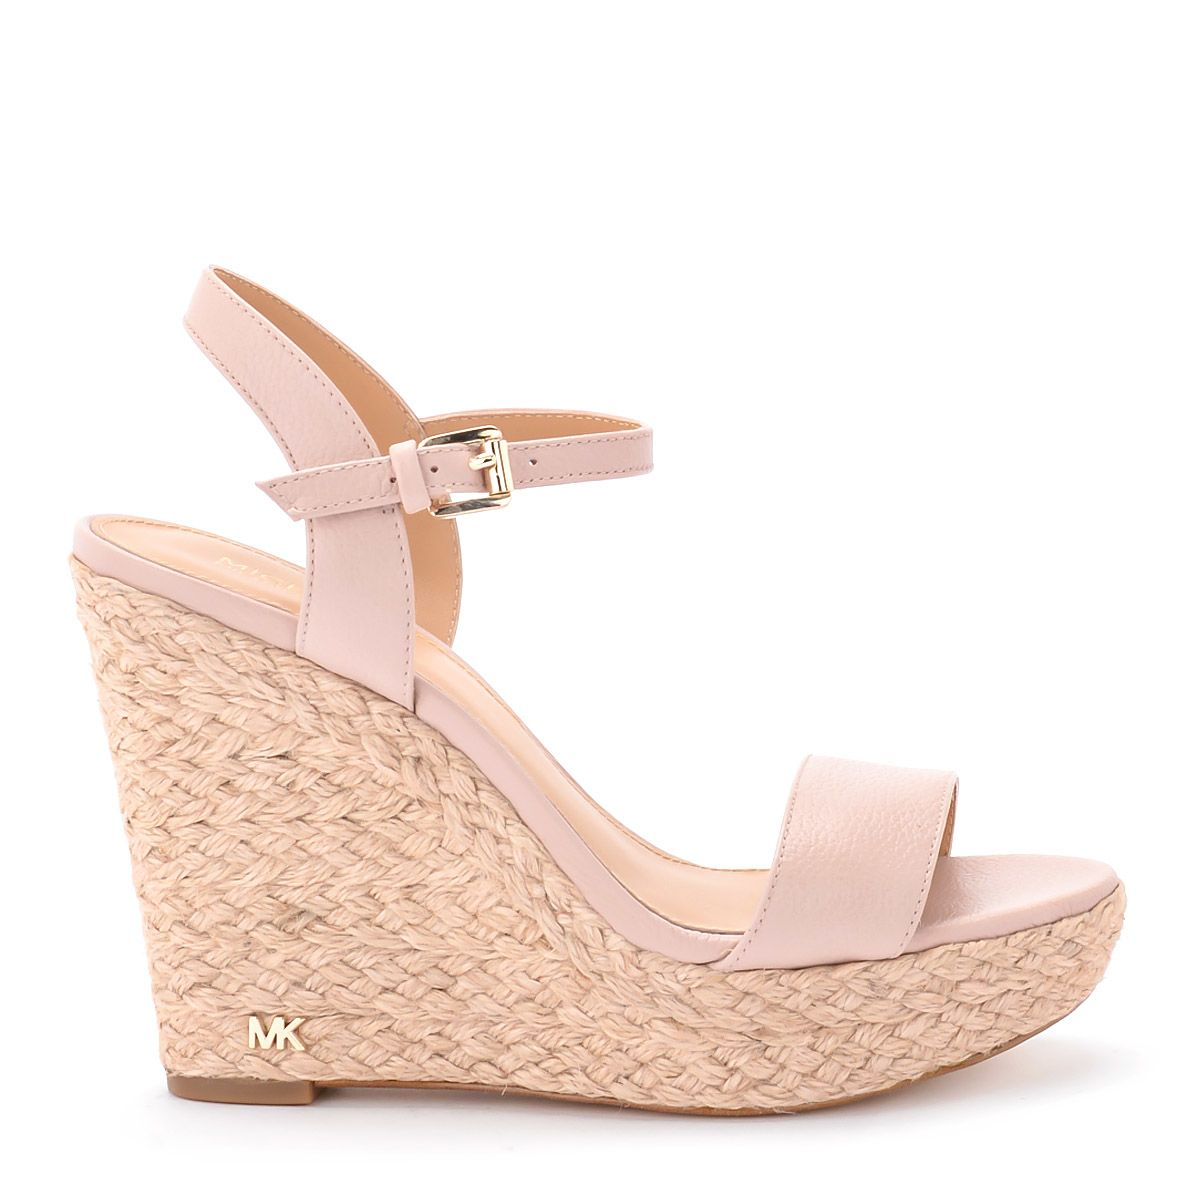 Michael Kors Jill Pale Pink Wedge Sandal